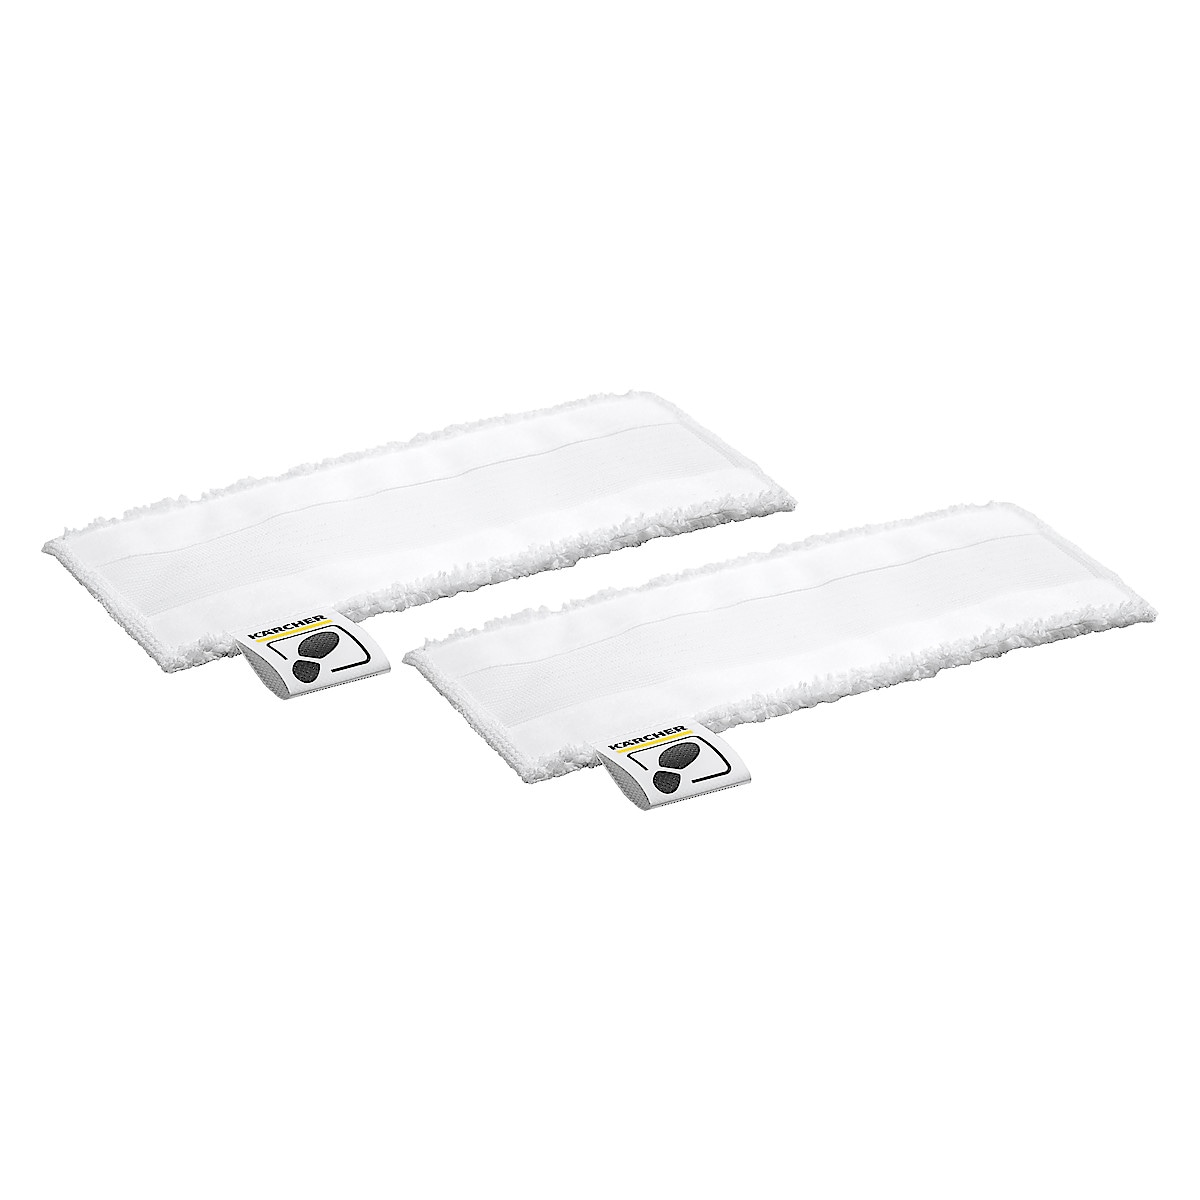 Höyrypesuri Kärcher SC 3 Upright Easyfix Premium